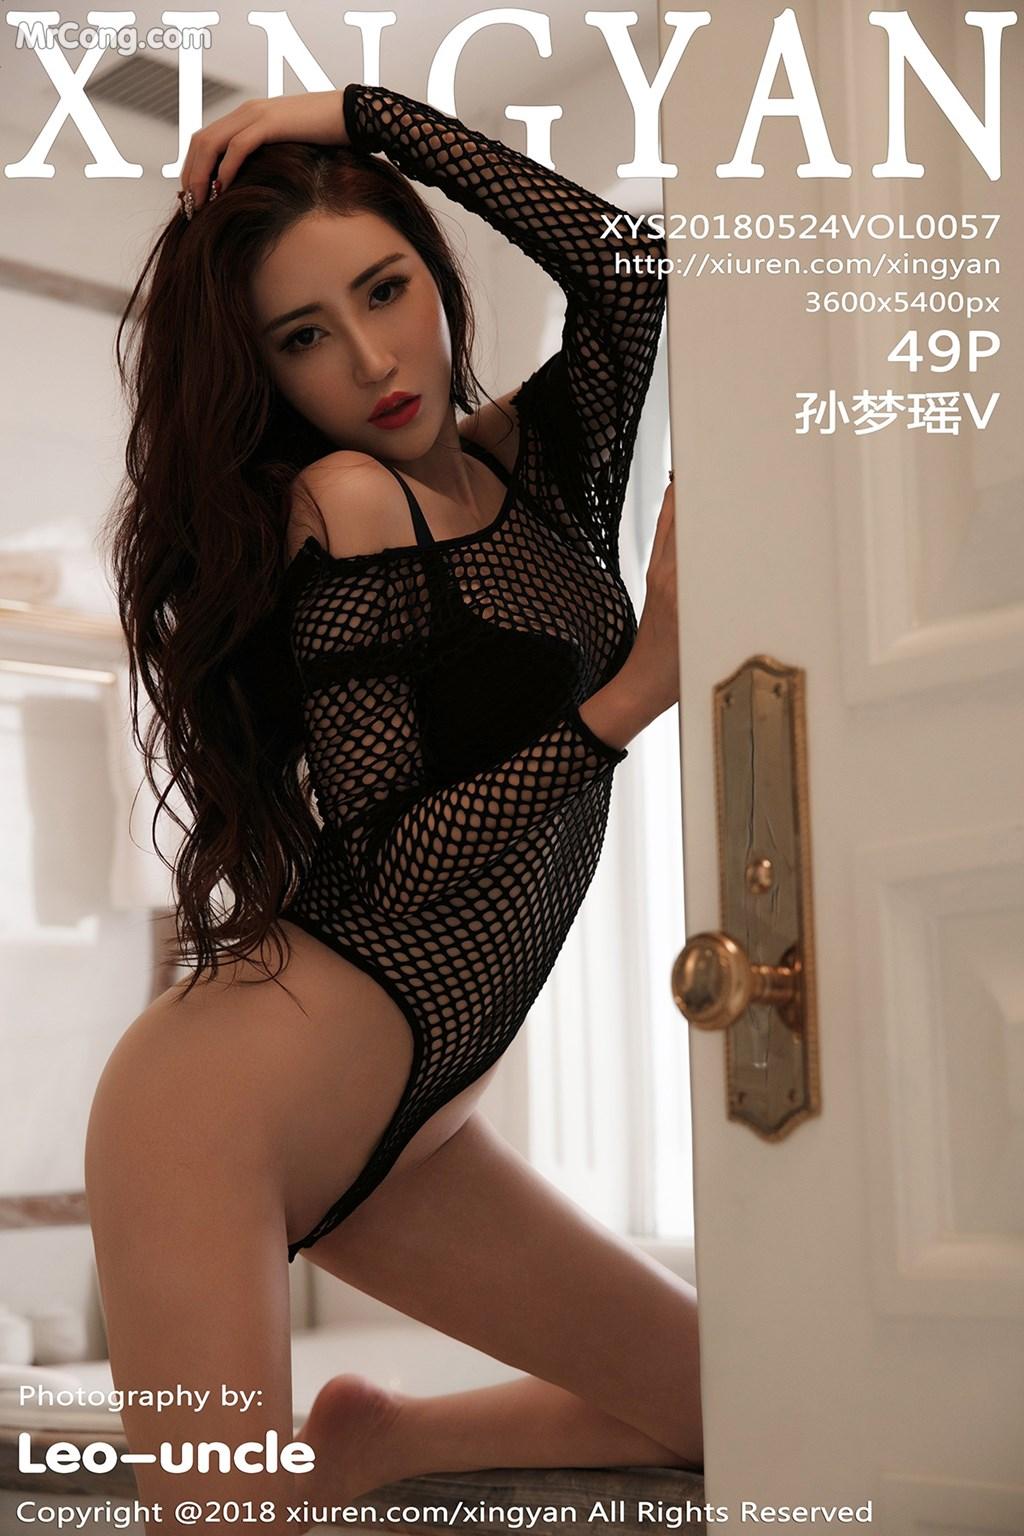 XingYan Vol.057: Người mẫu Sun Meng Yao (孙梦瑶V) (50 ảnh)